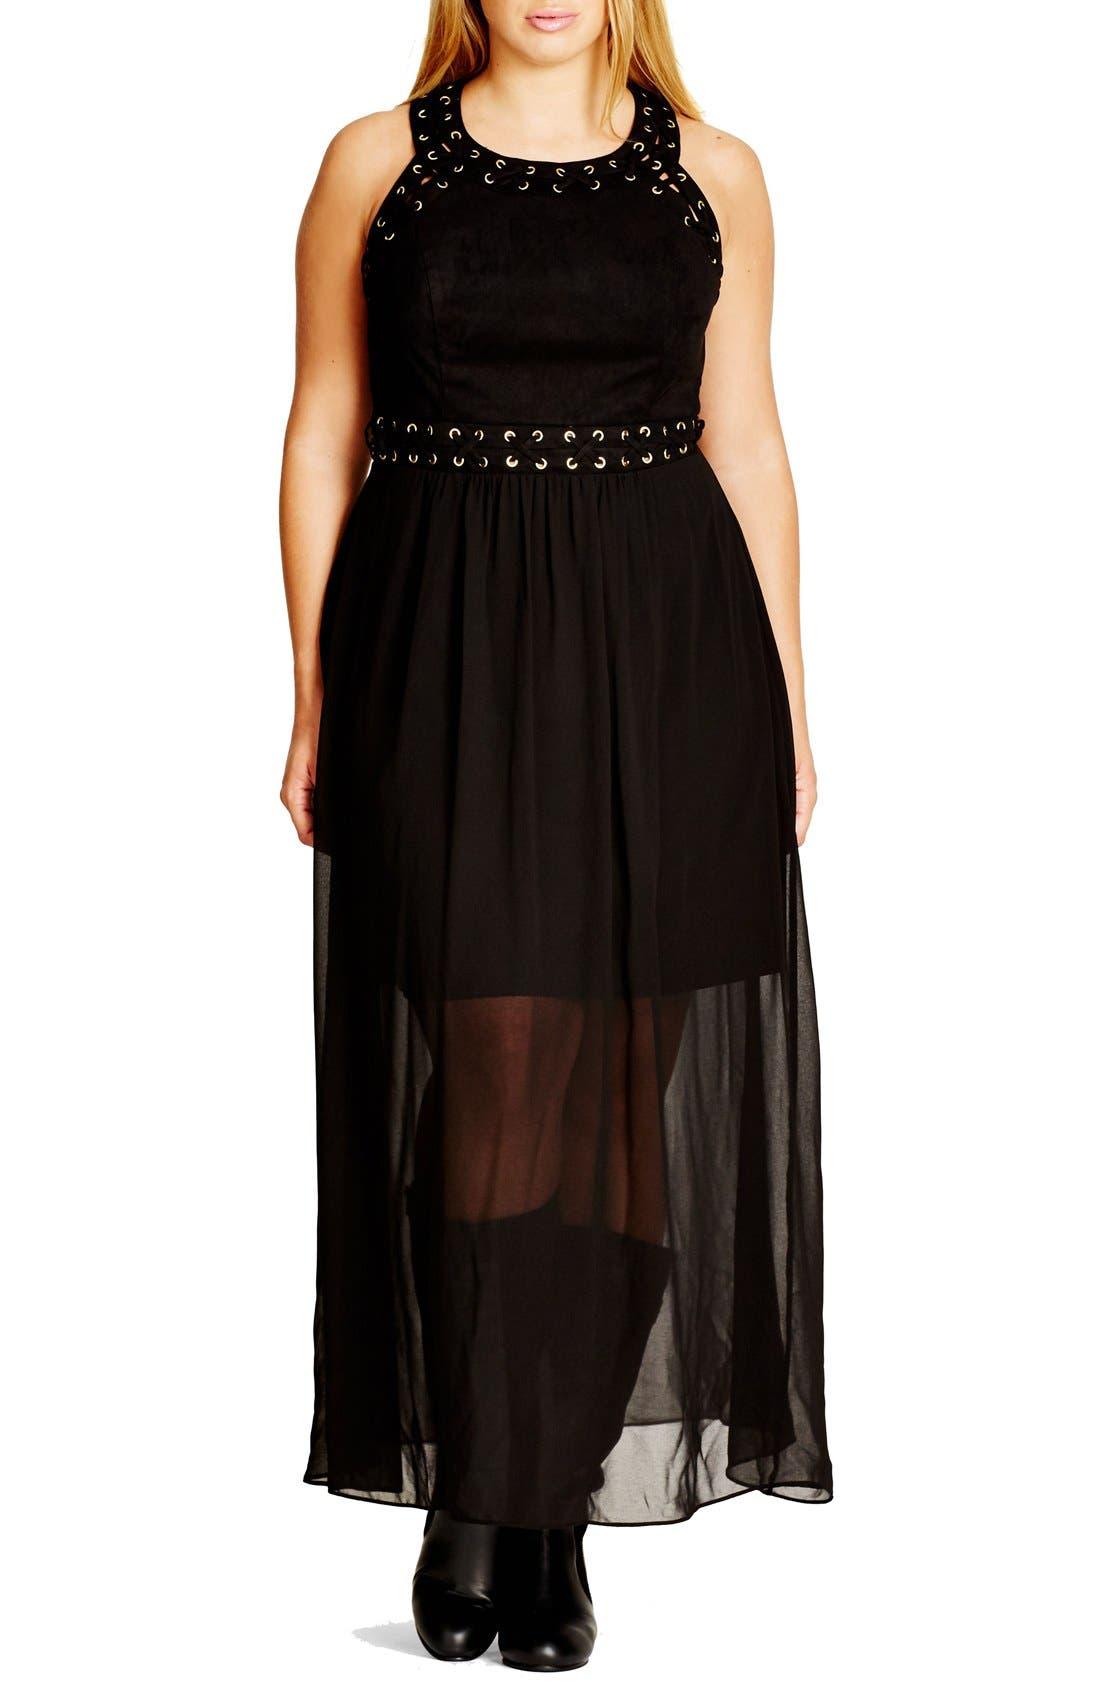 Alternate Image 1 Selected - City Chic 'Rhianna' Lace-Up Trim Faux Suede & Chiffon Maxi Dress (Plus Size)